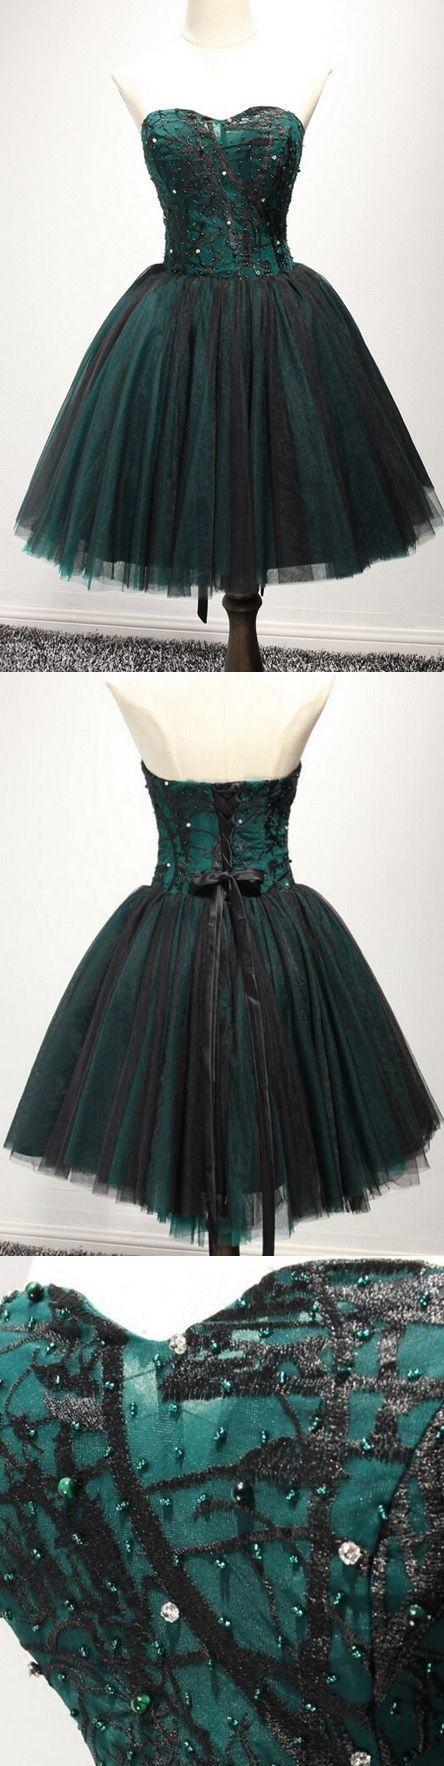 Beaded/Beading Sweetheart Homecoming Dresses BD2160